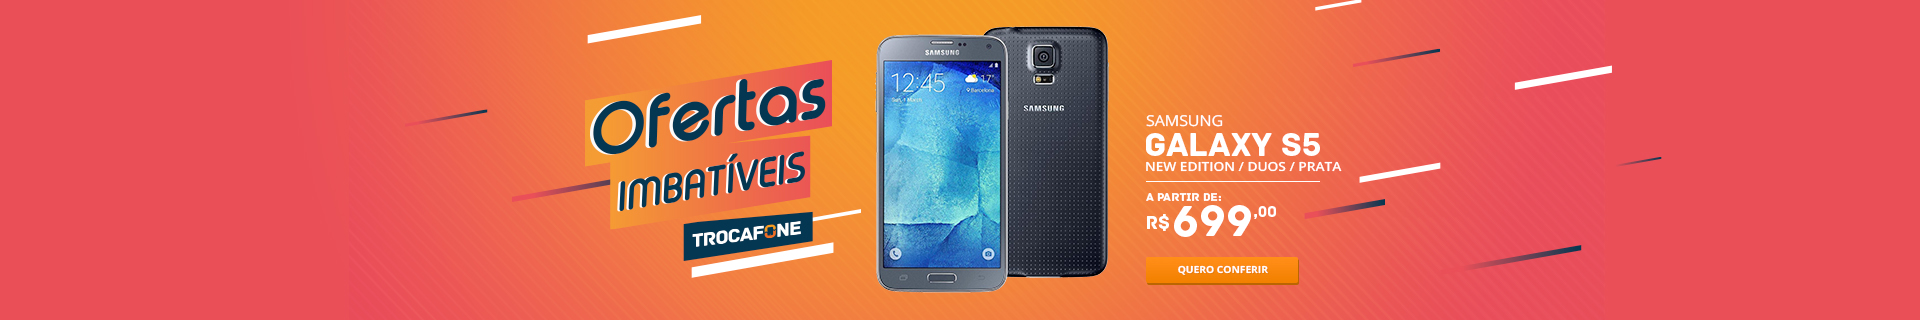 Trocafone | Samsung Galaxy S5 New Edition Duos